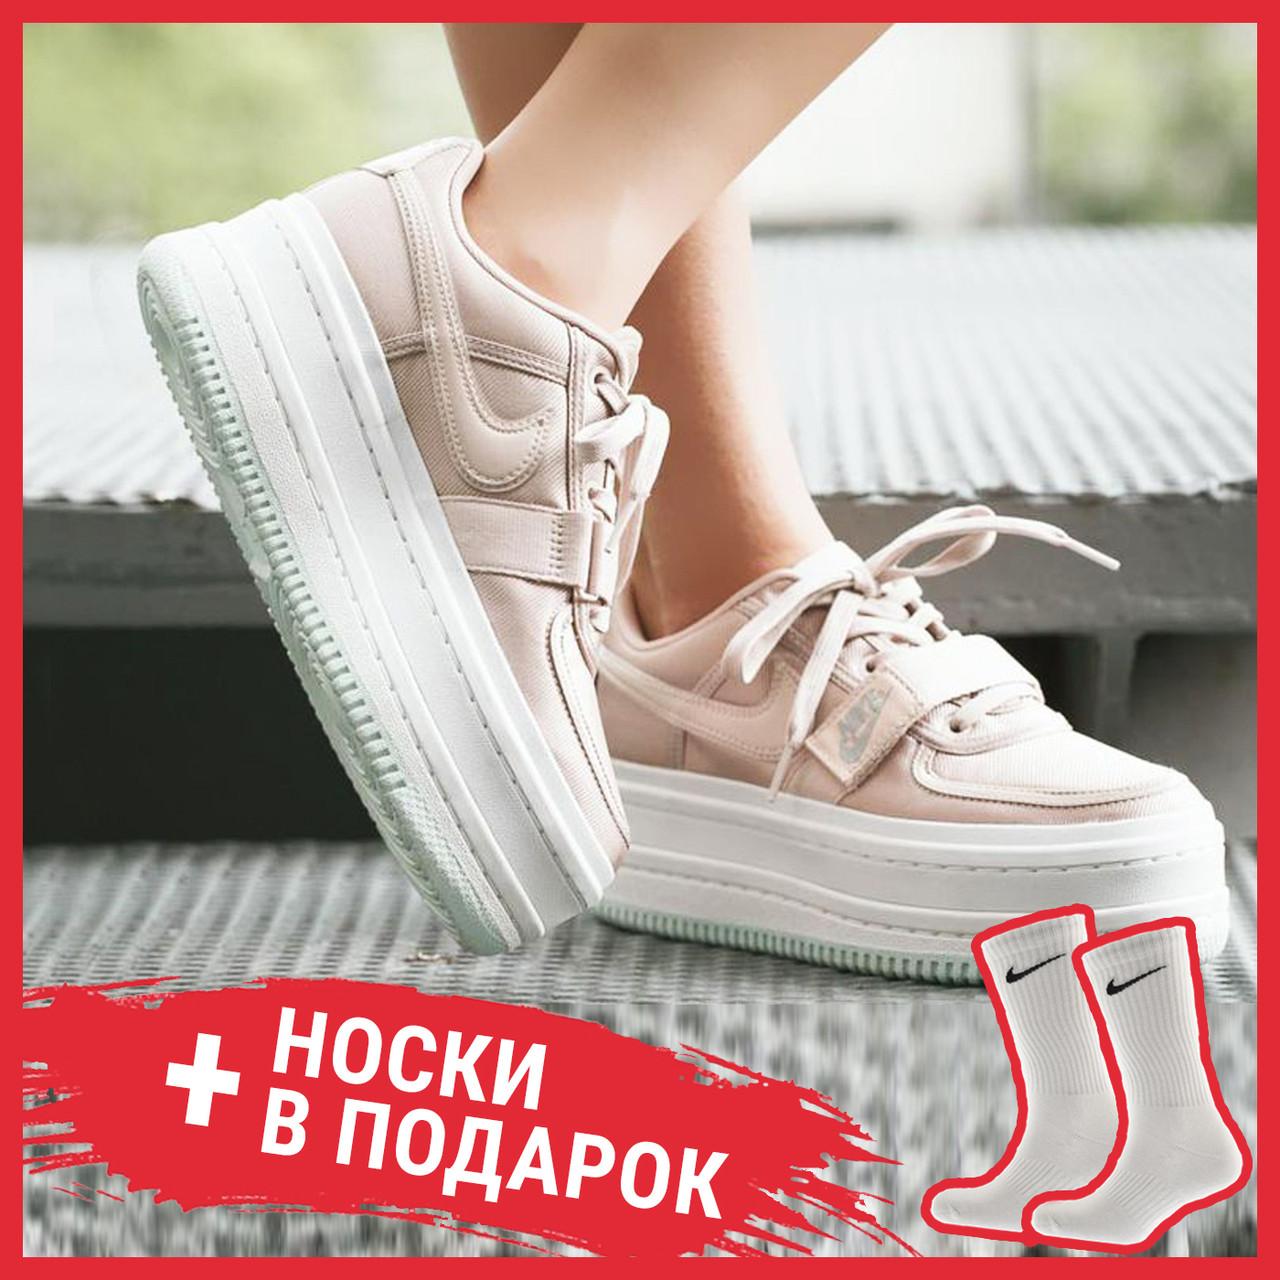 Женские кроссовки Nike Vandal 2K Particle Beige AO2868-200, Найк Вандал 2К